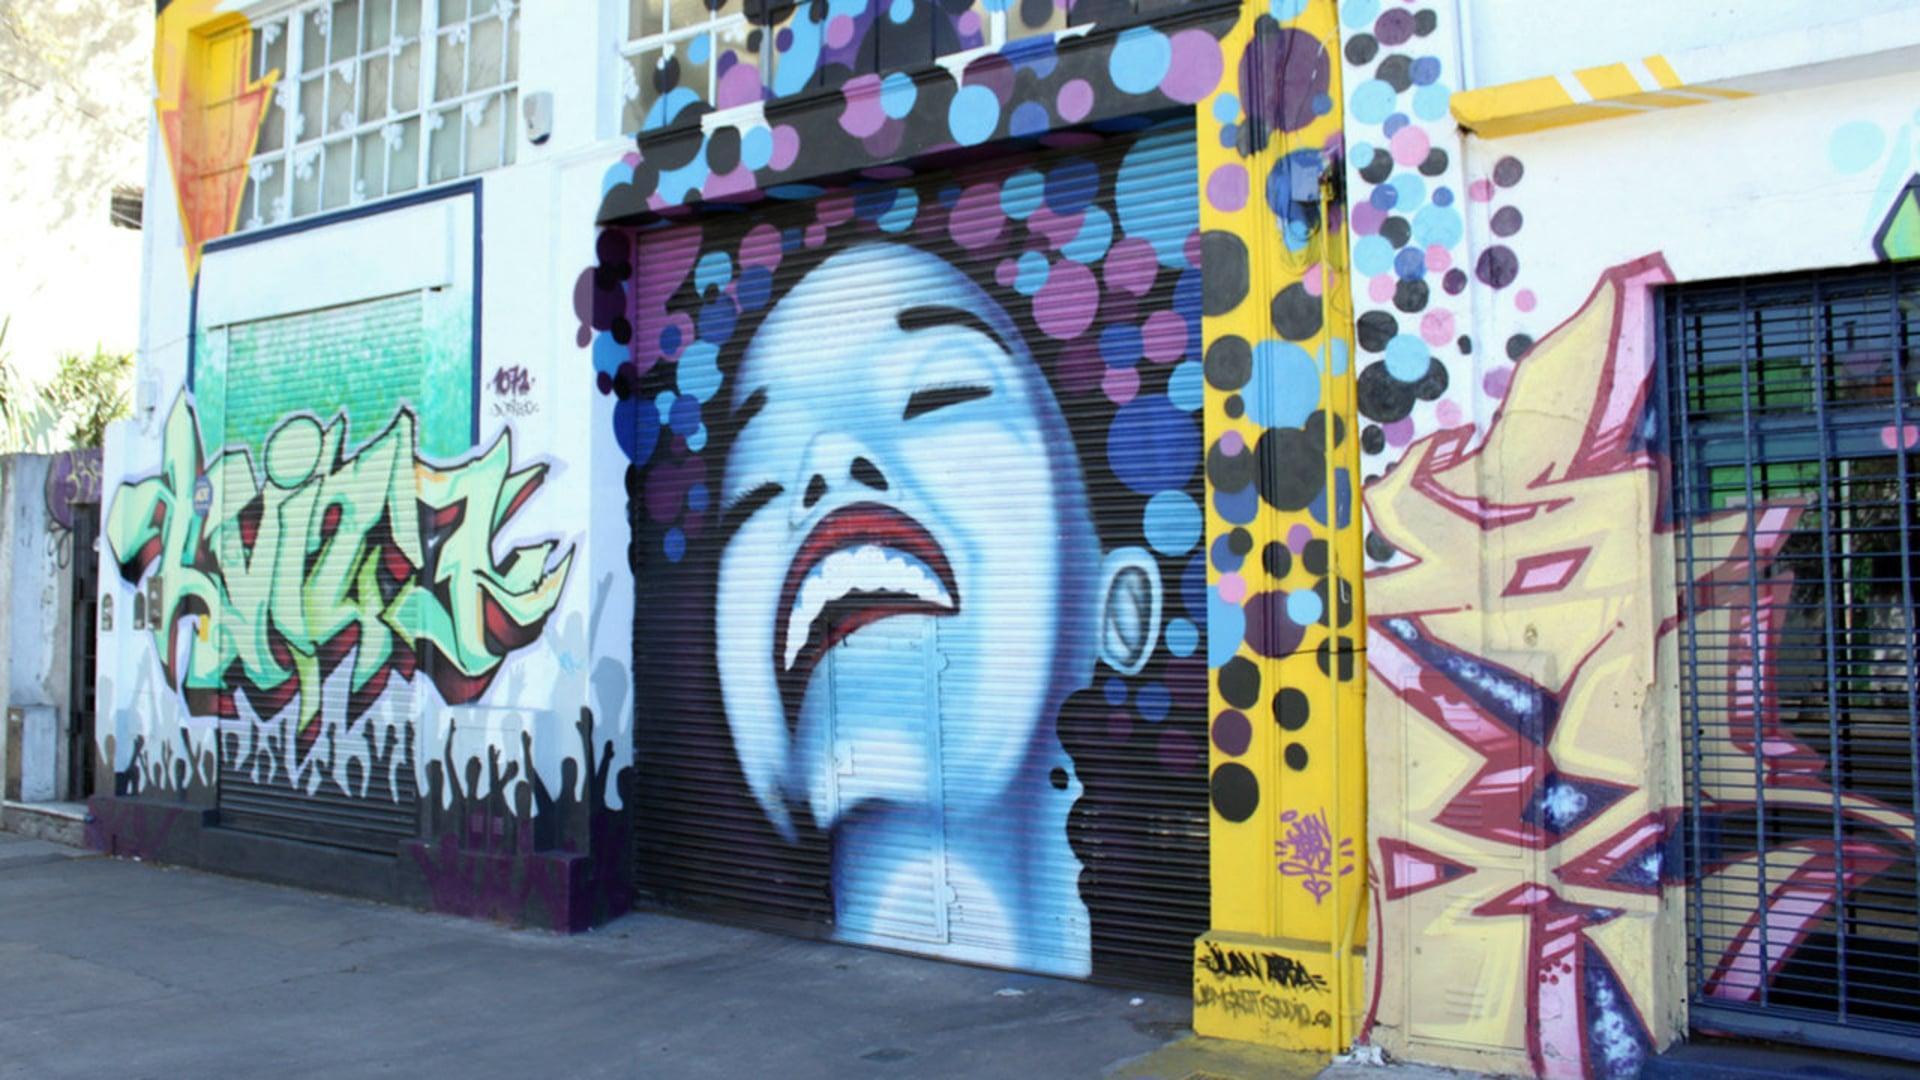 Urban art in motion